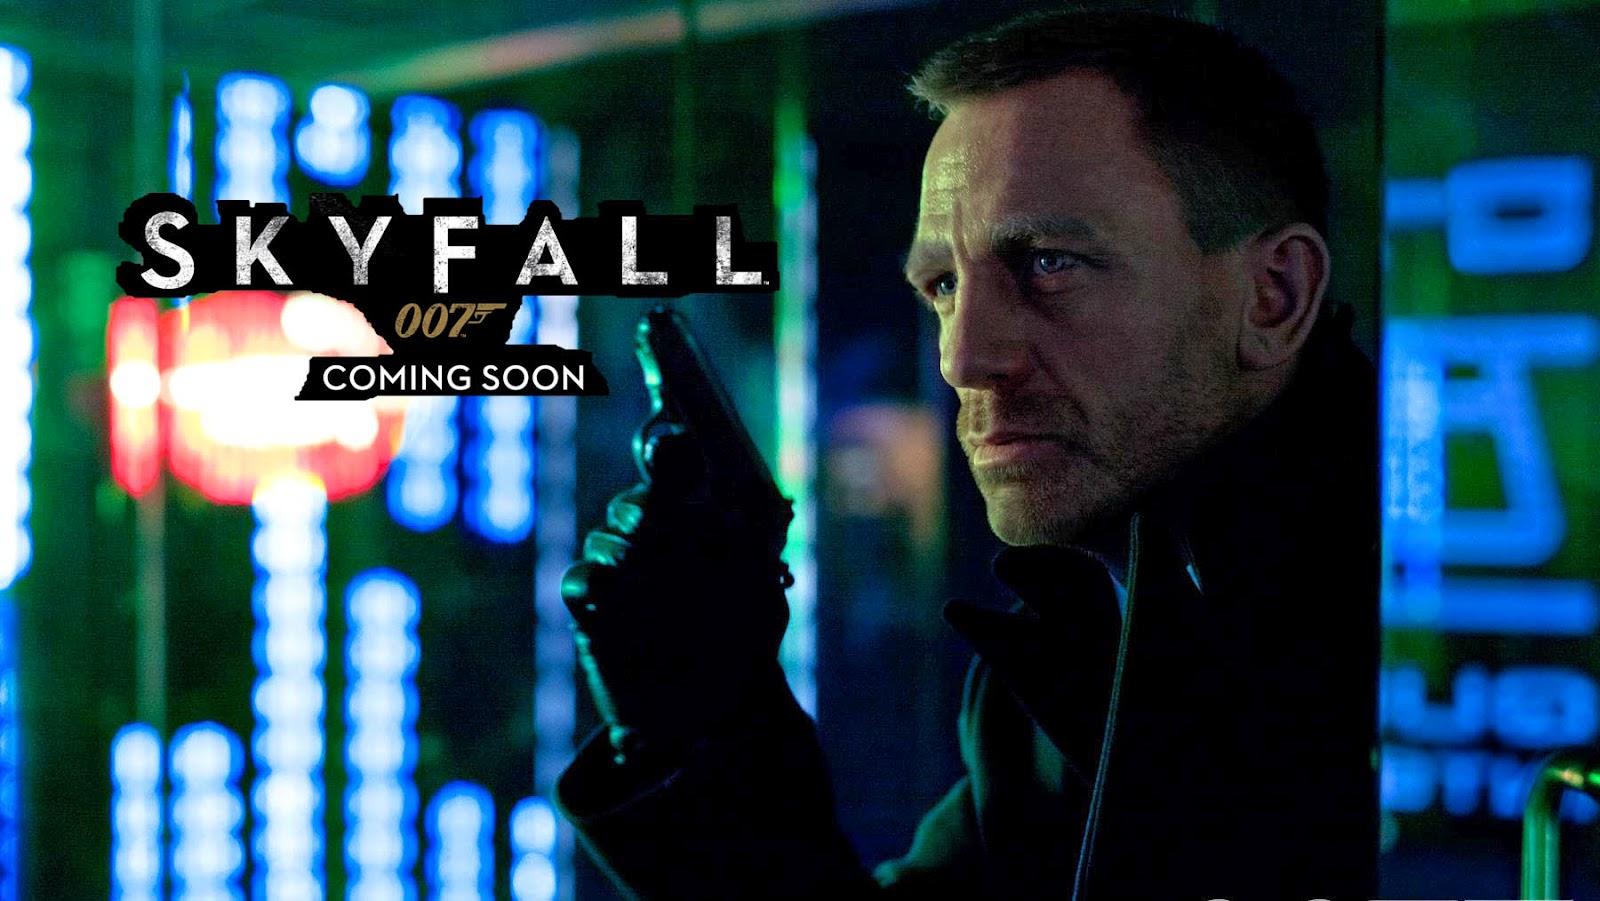 http://3.bp.blogspot.com/-LlUaNCKFkT8/UDCUq3hWXlI/AAAAAAAAAr4/54F1yrusRyY/s1600/skyfall-movie-image-james-bond-daniel-craig.jpg